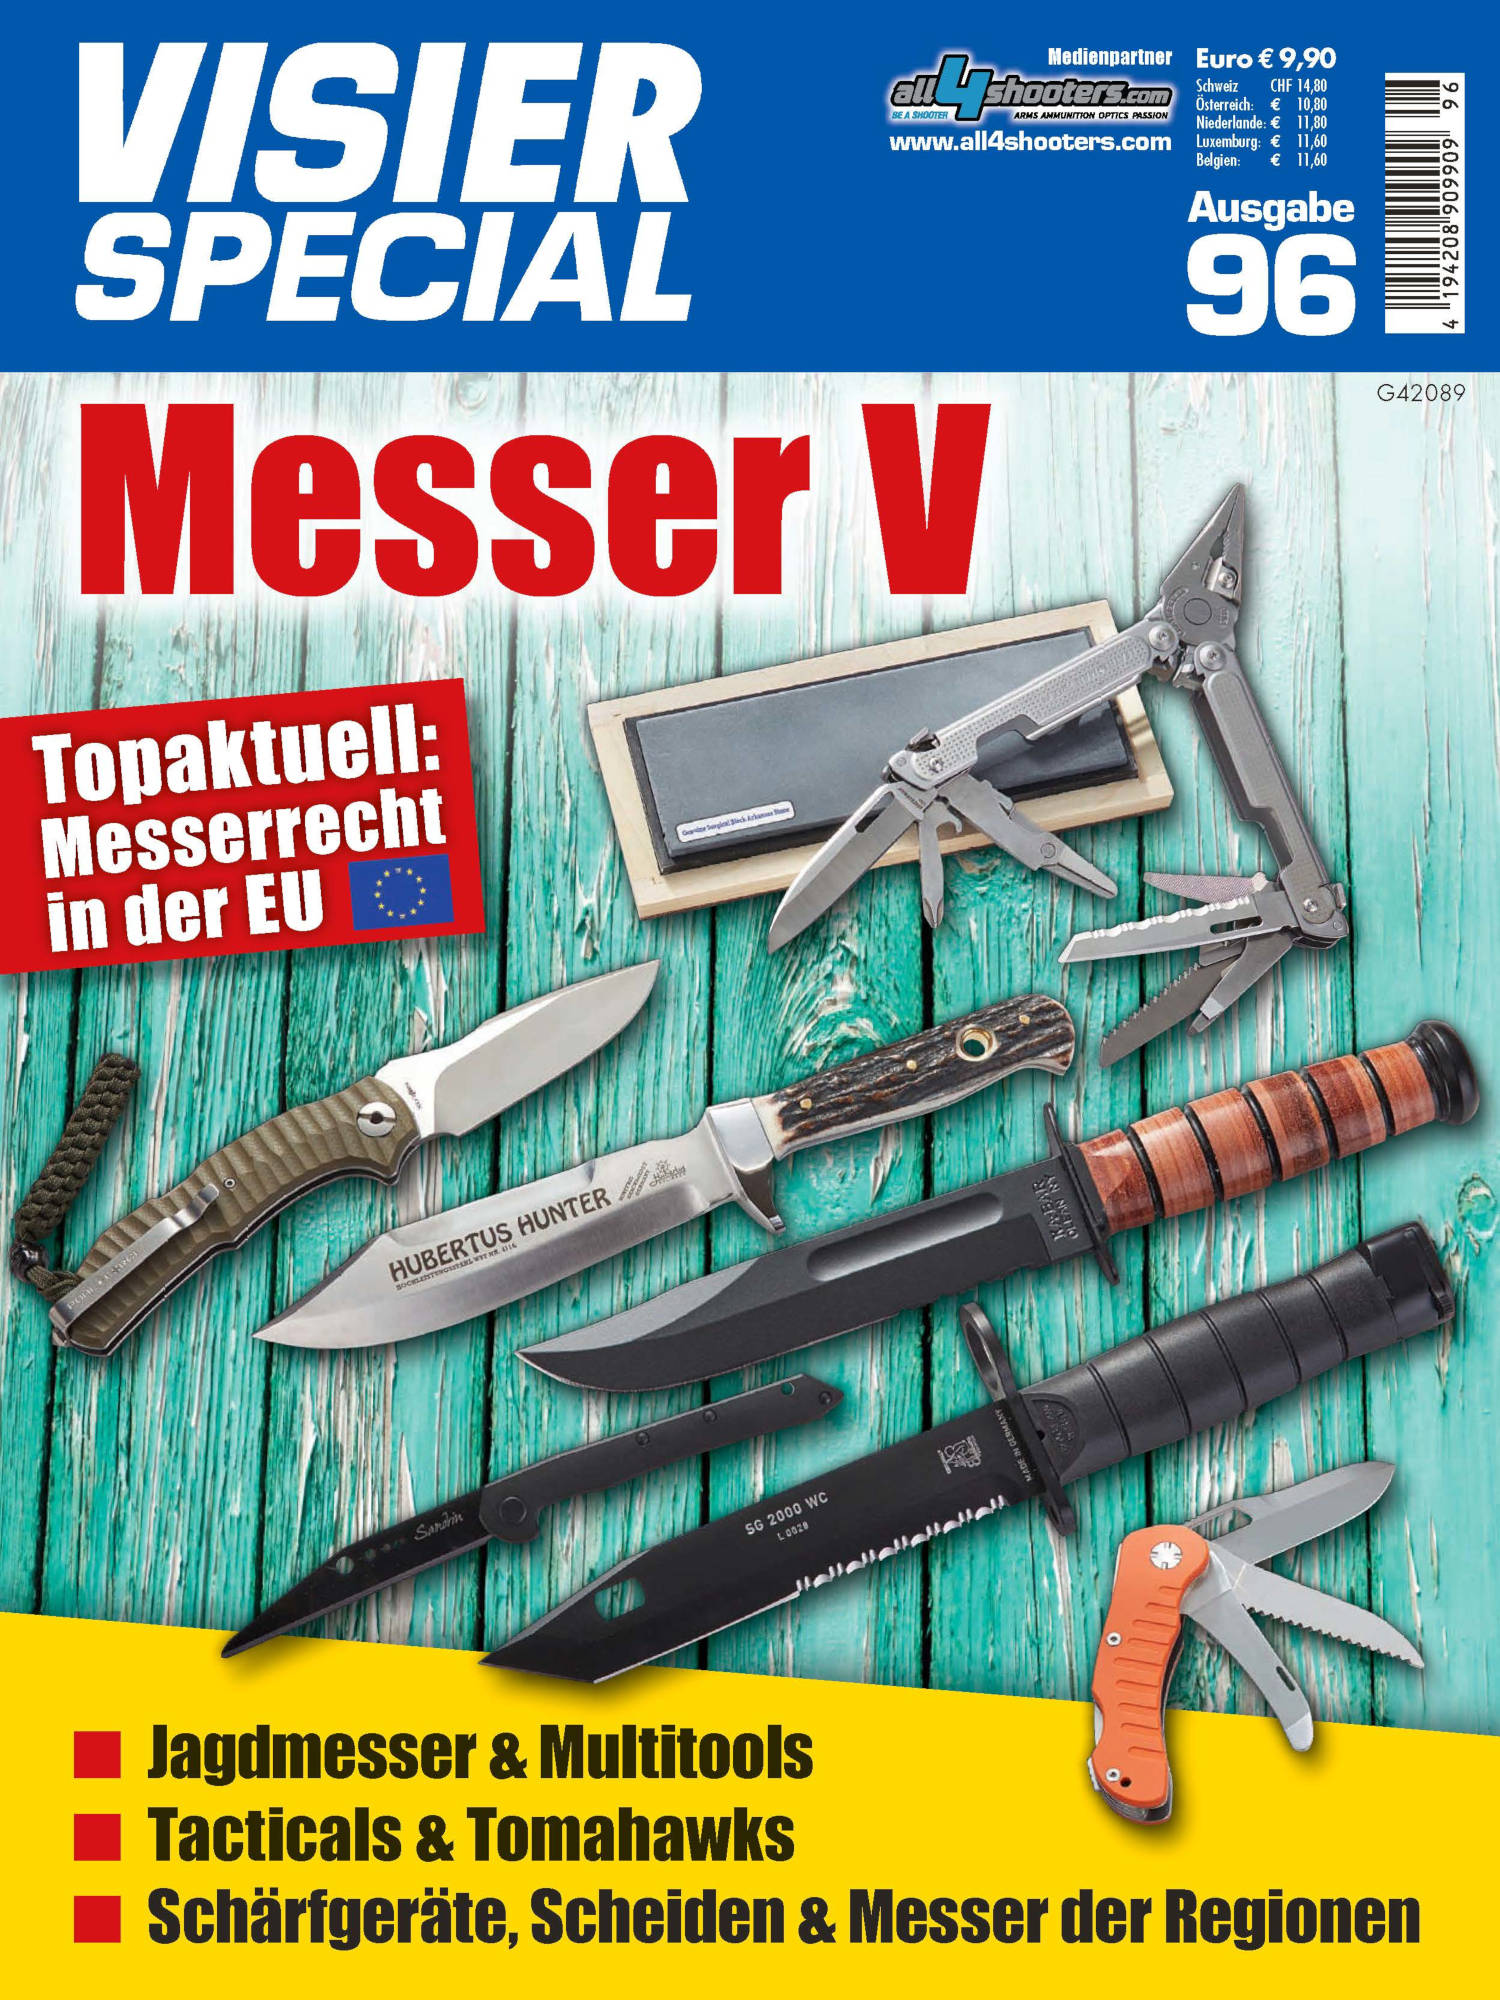 VISIER Special 96